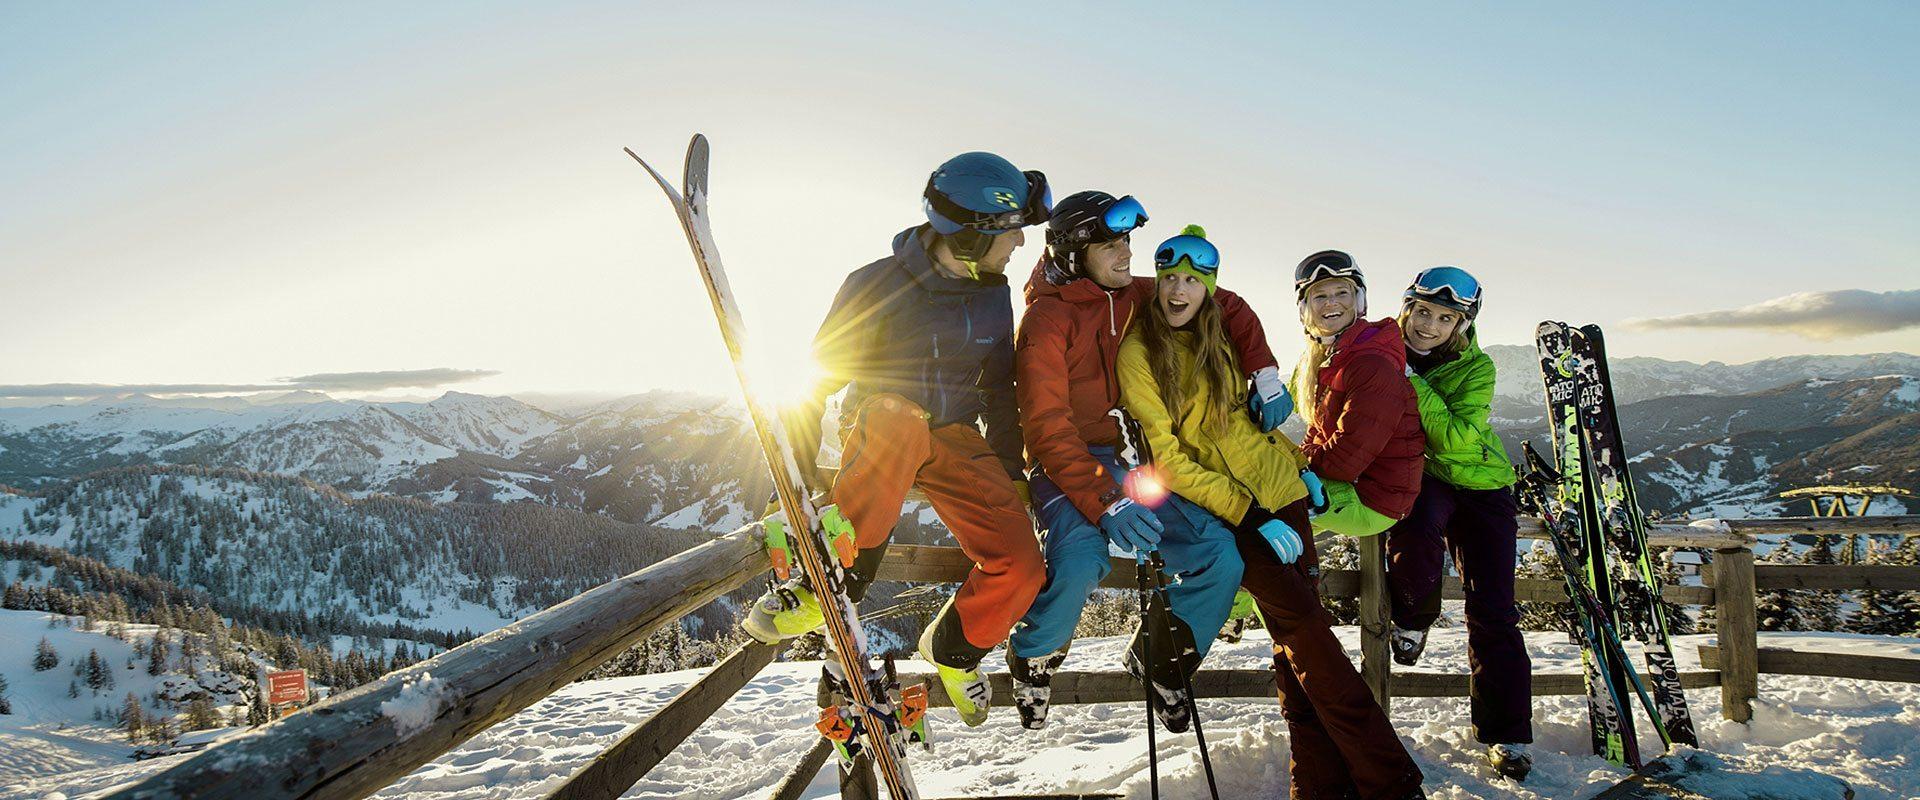 Skiurlaub & Winterurlaub in Flachau, Ski amadé